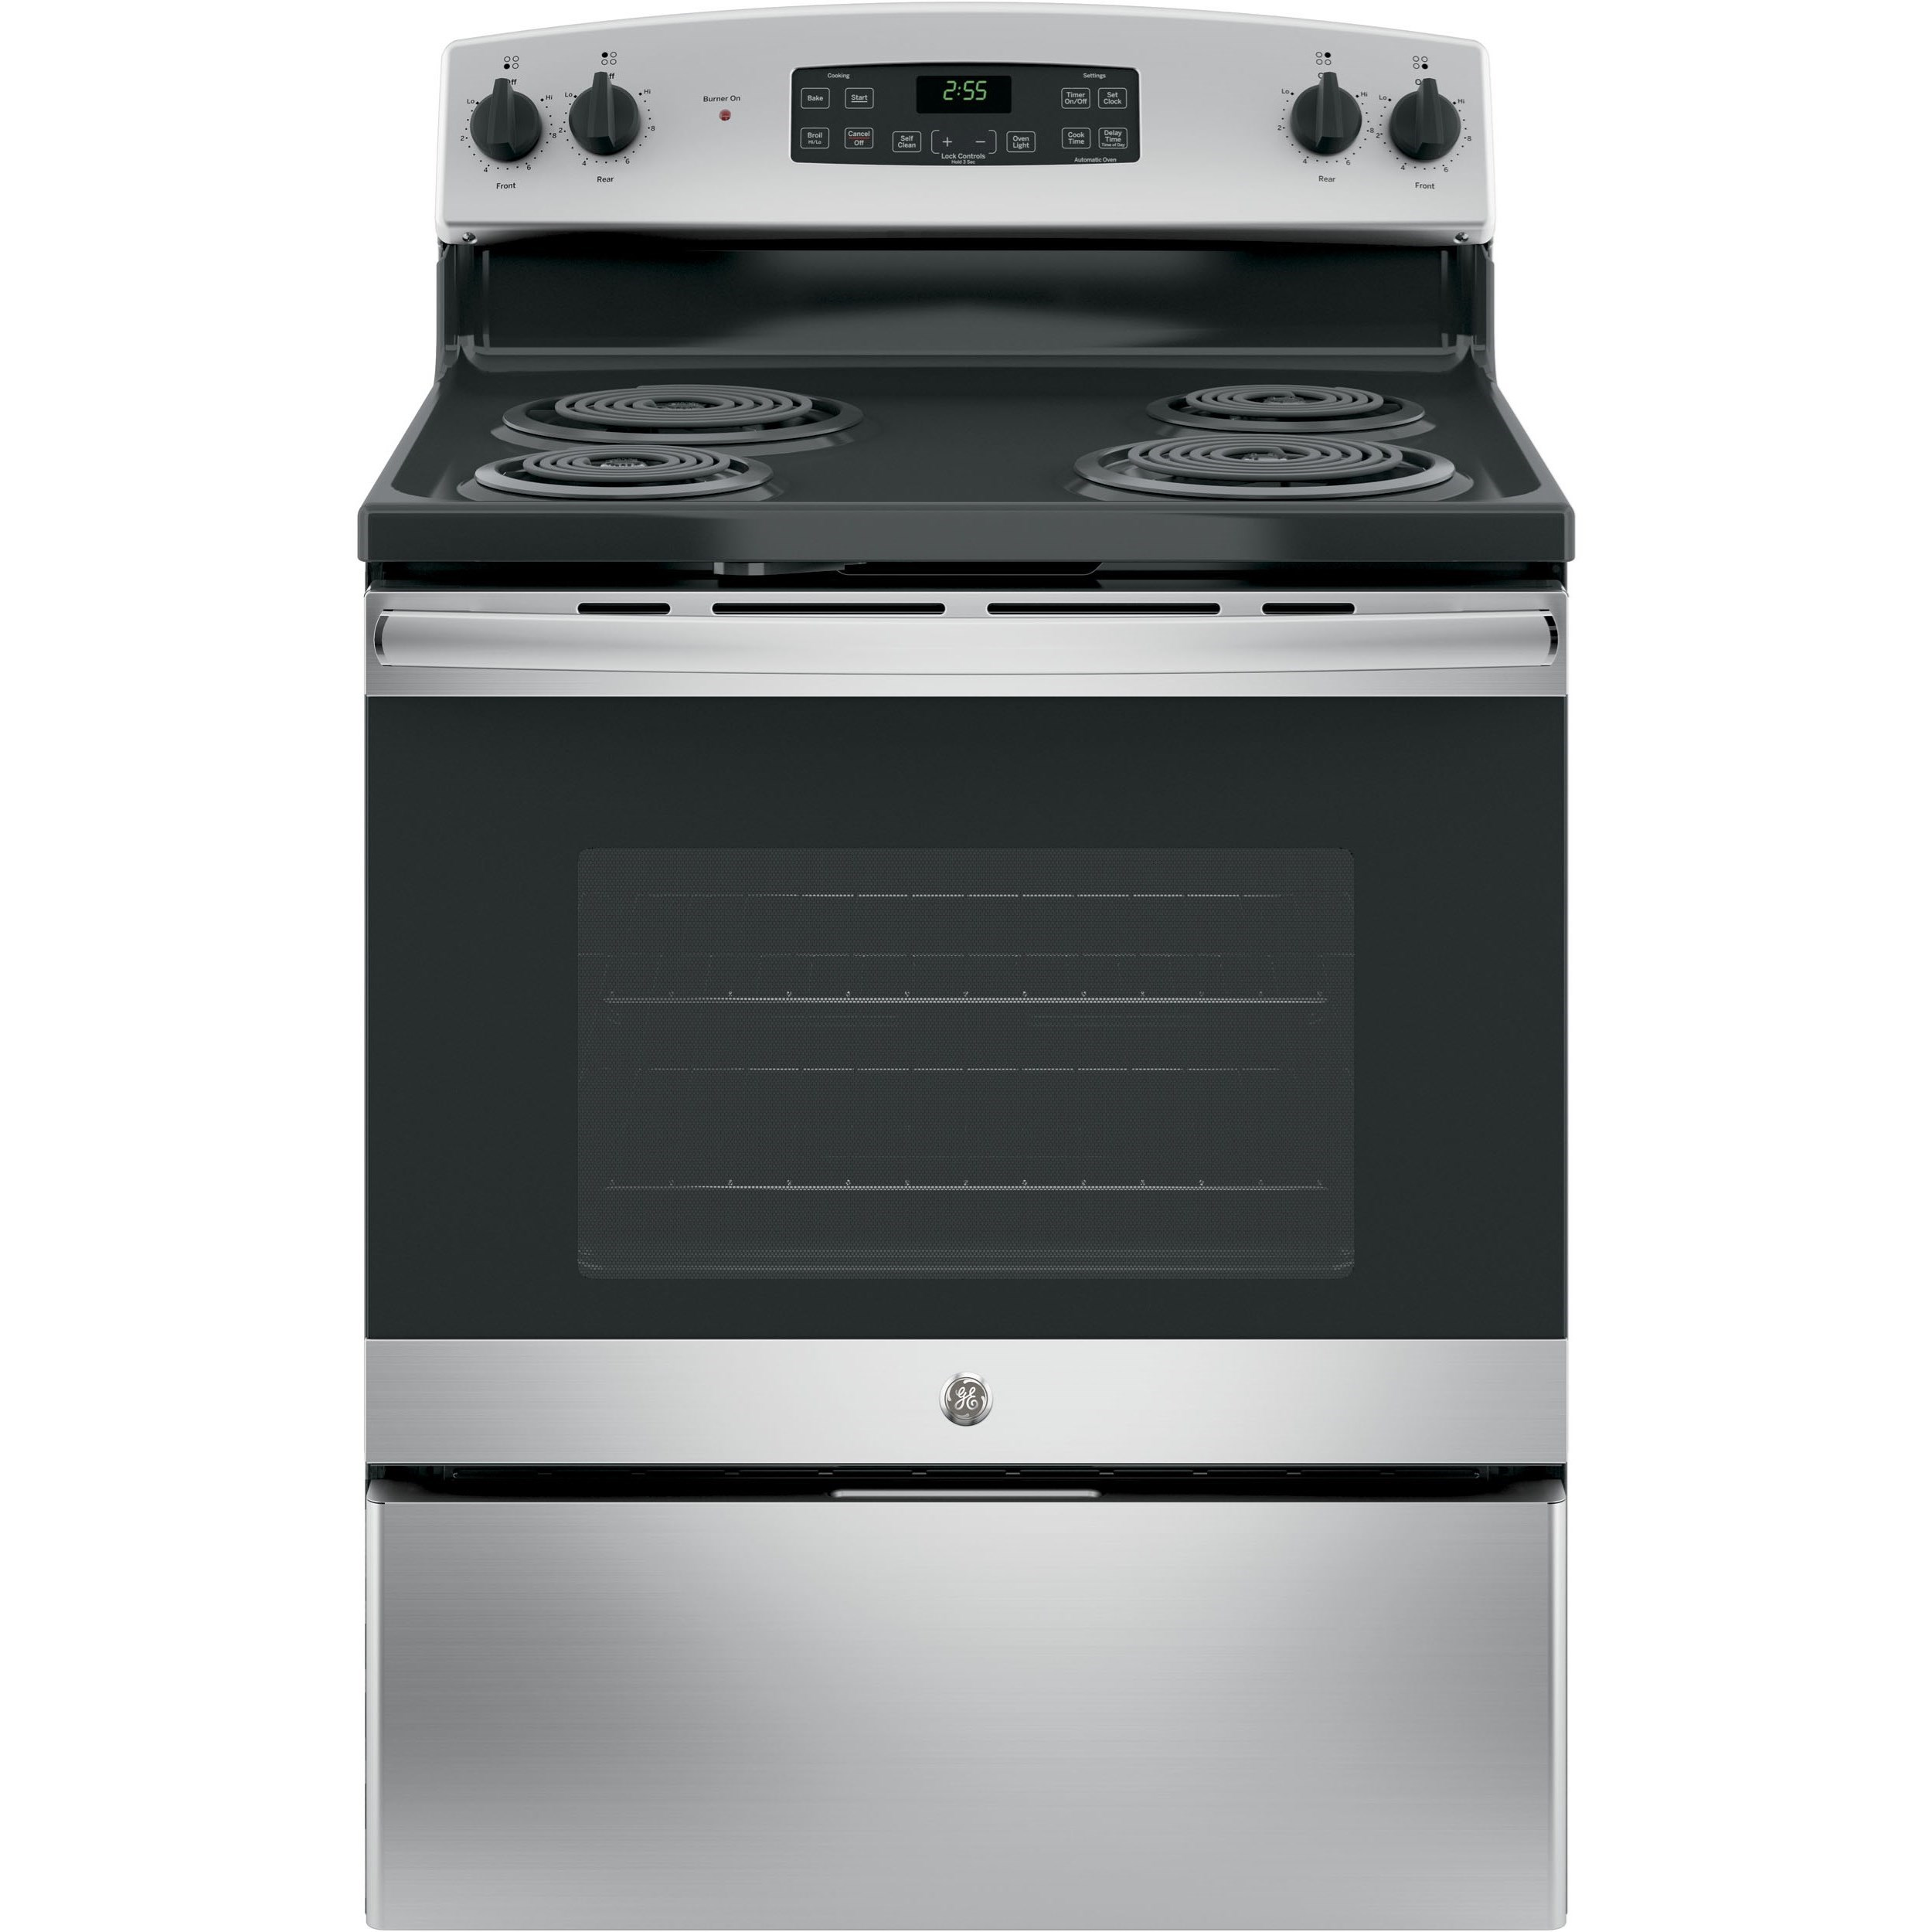 "GE Appliances GE Electric Ranges GE® 30"" Free-Standing Electric Range - Item Number: JB255RKSS"